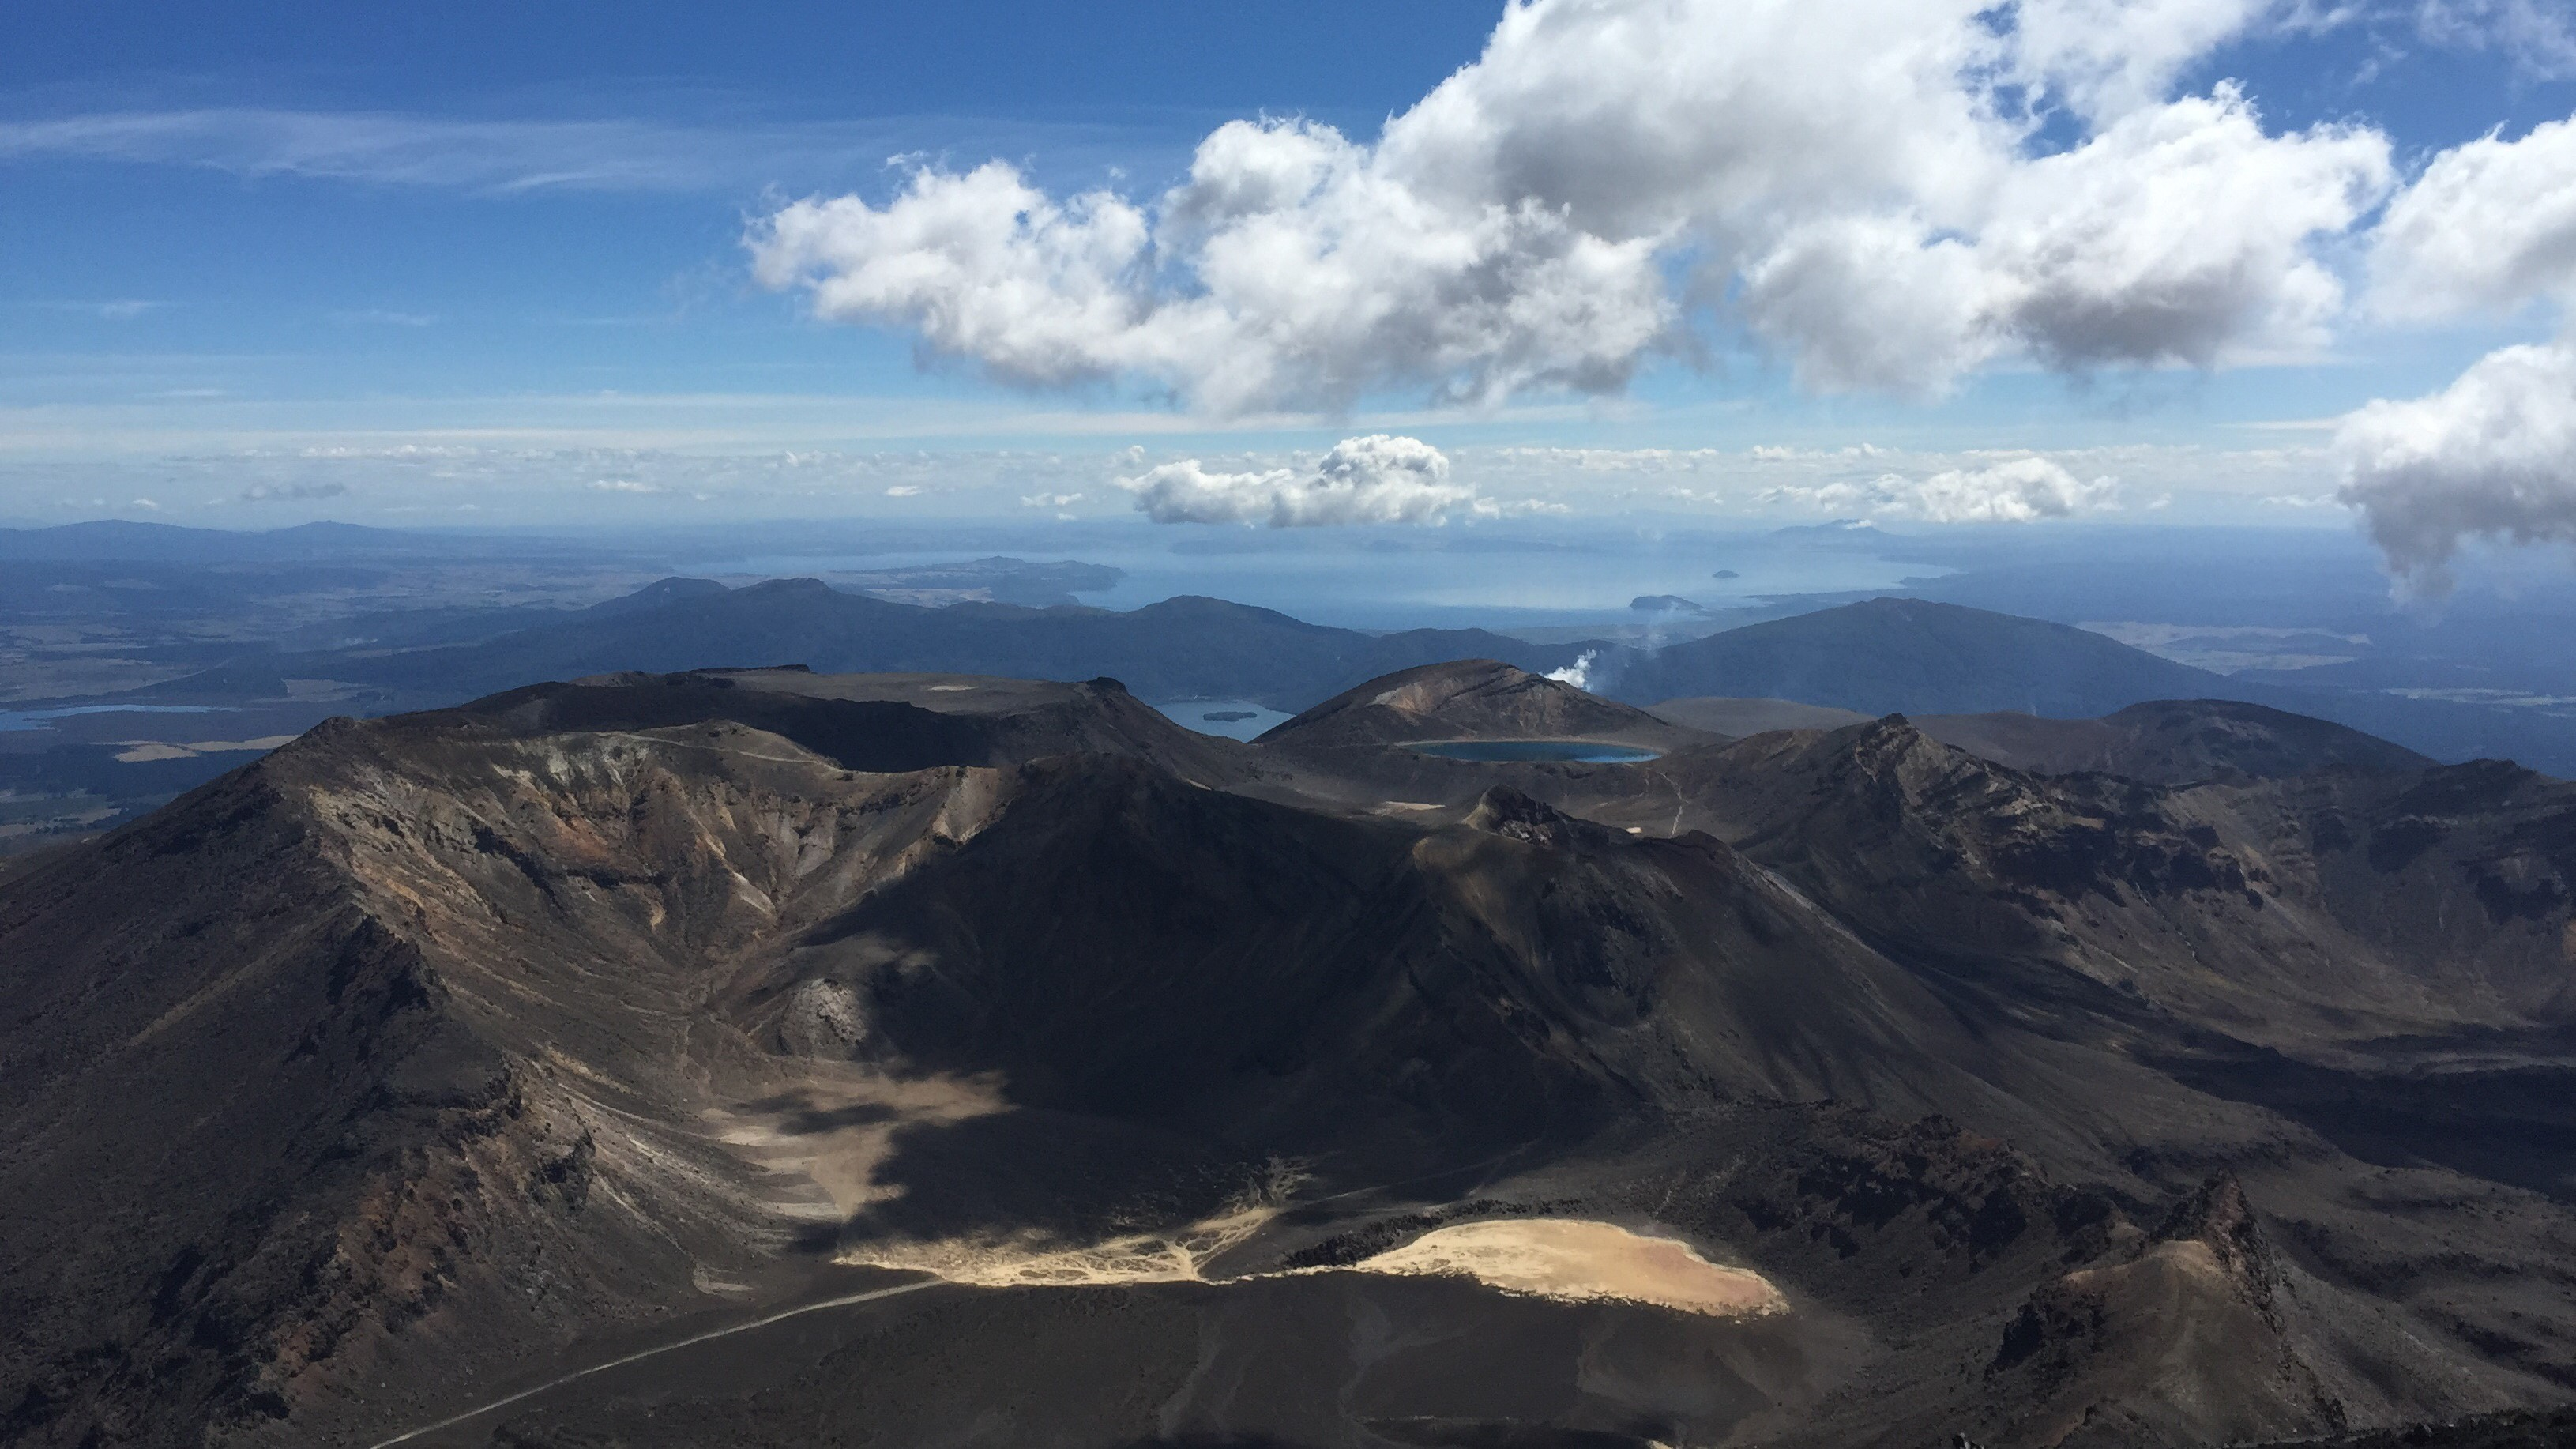 New Zealand volcano mountains